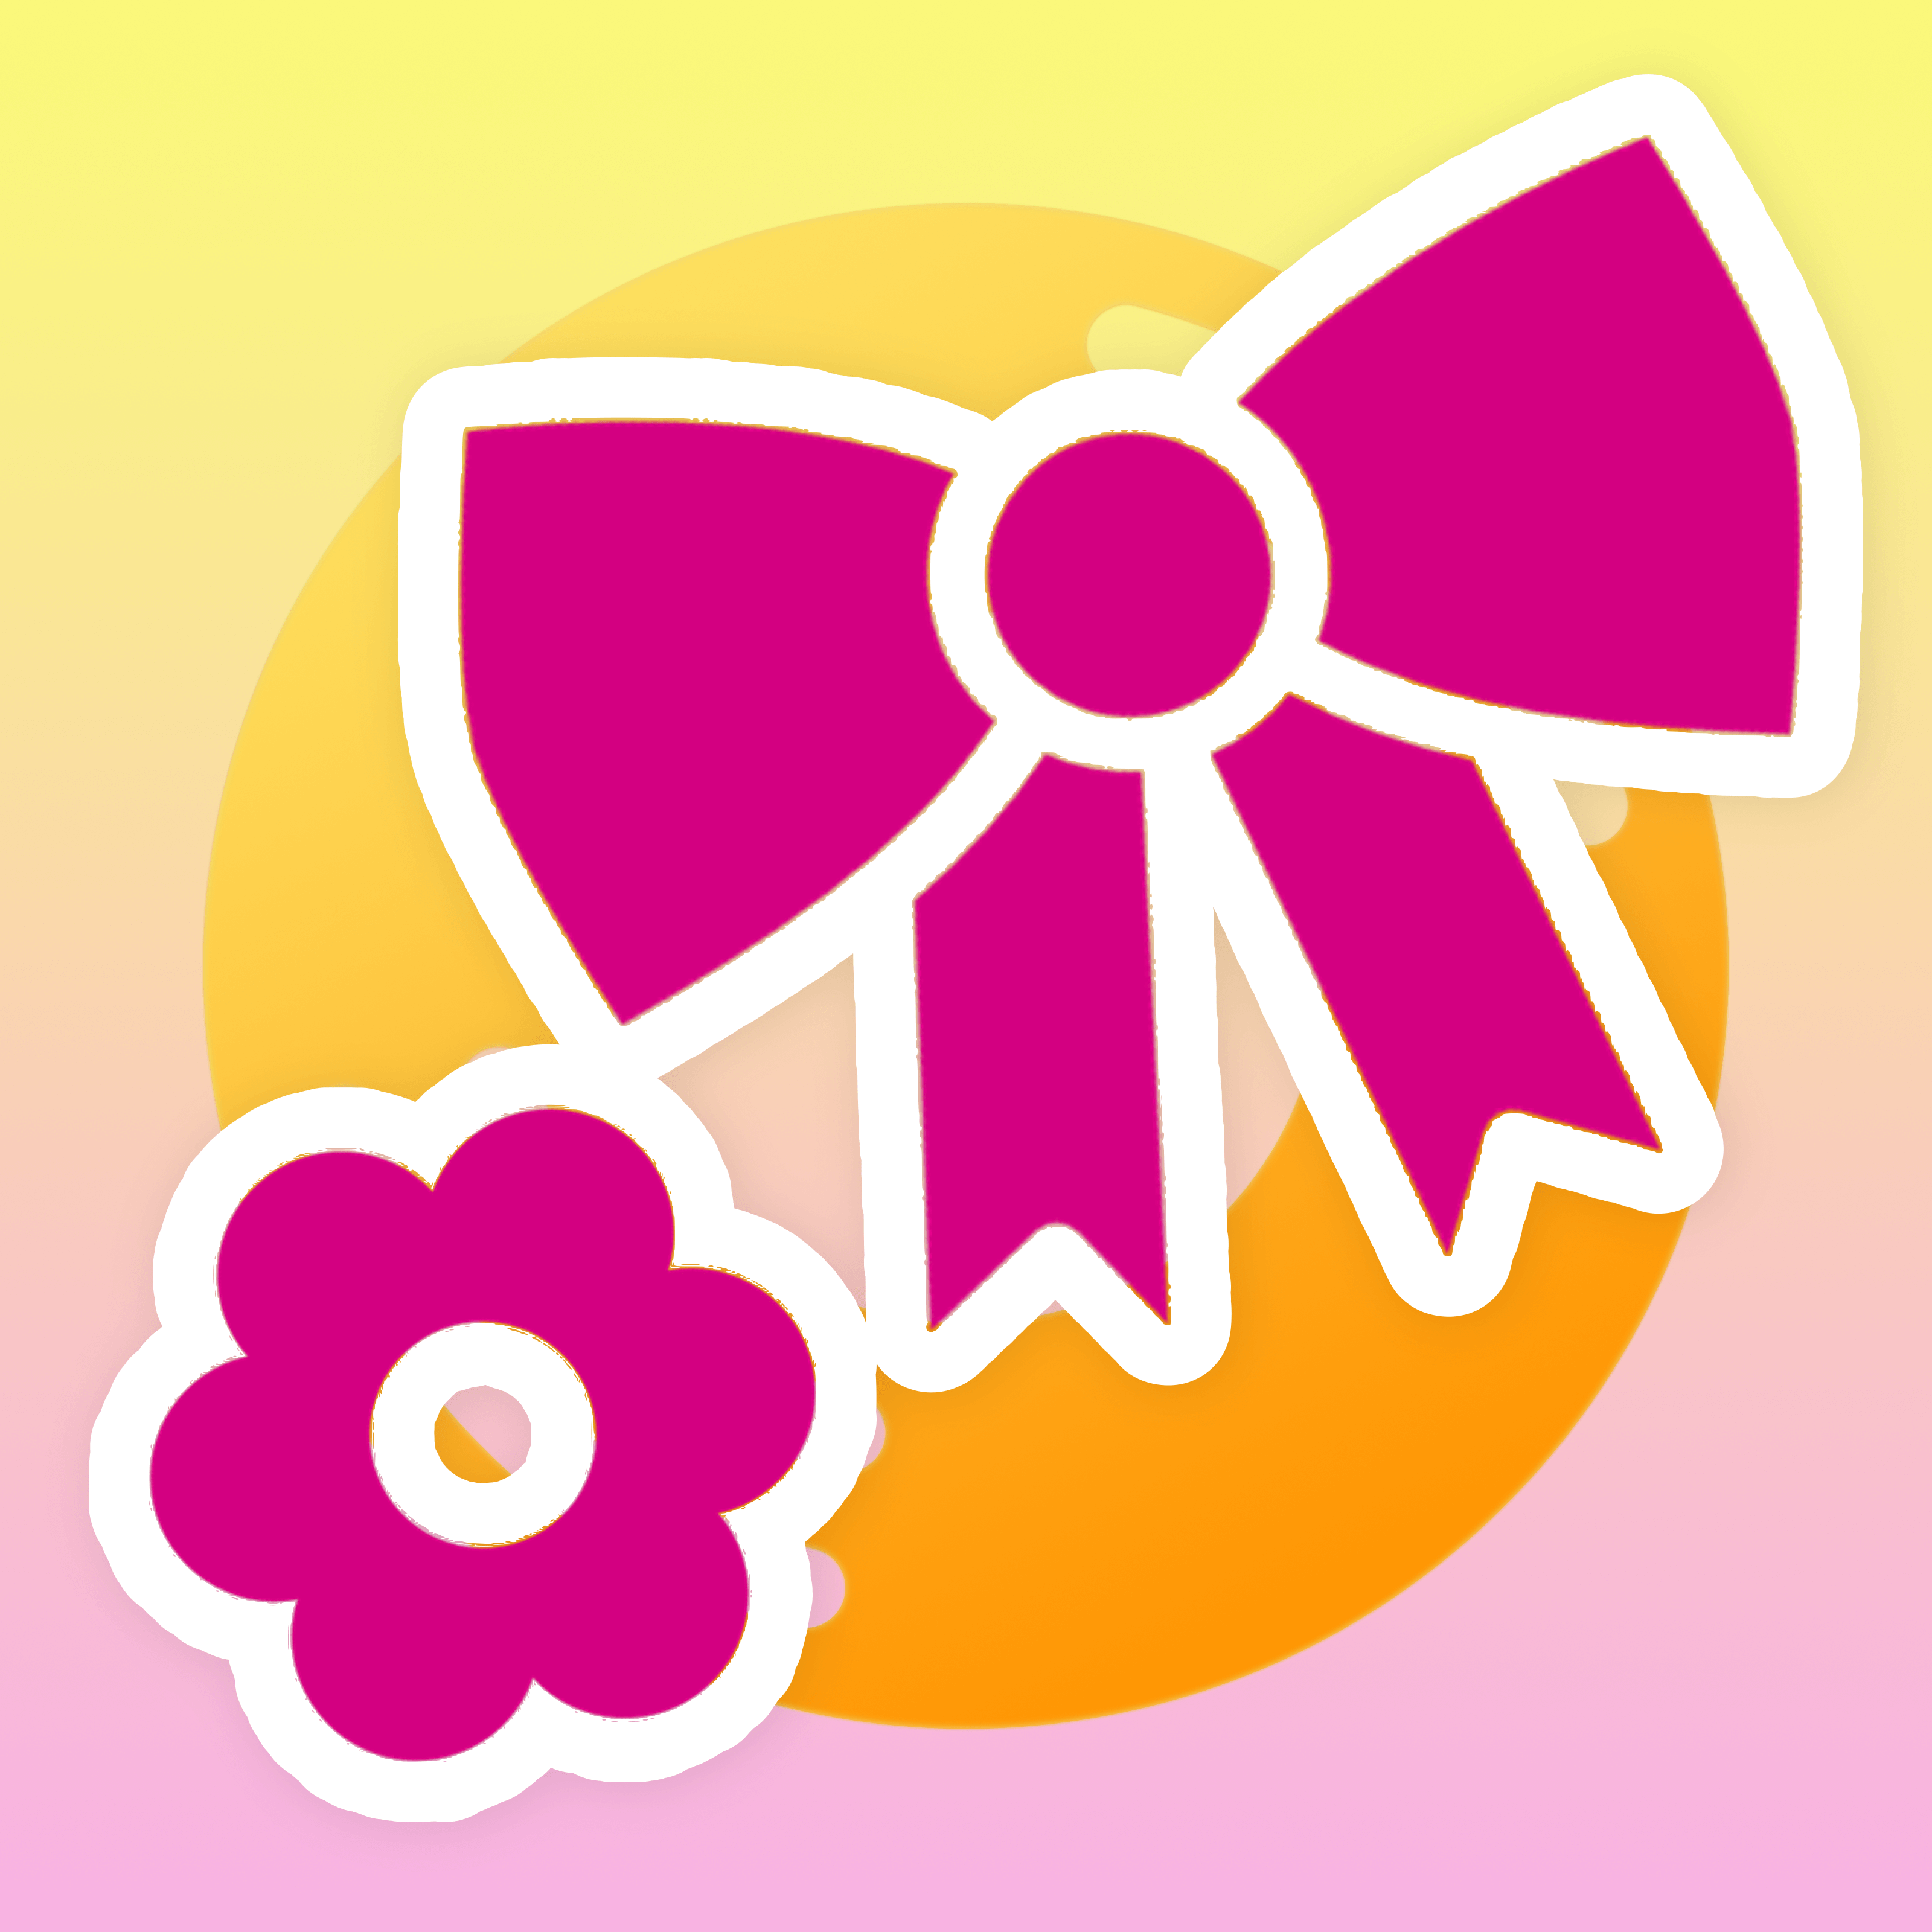 Izumi_12 avatar